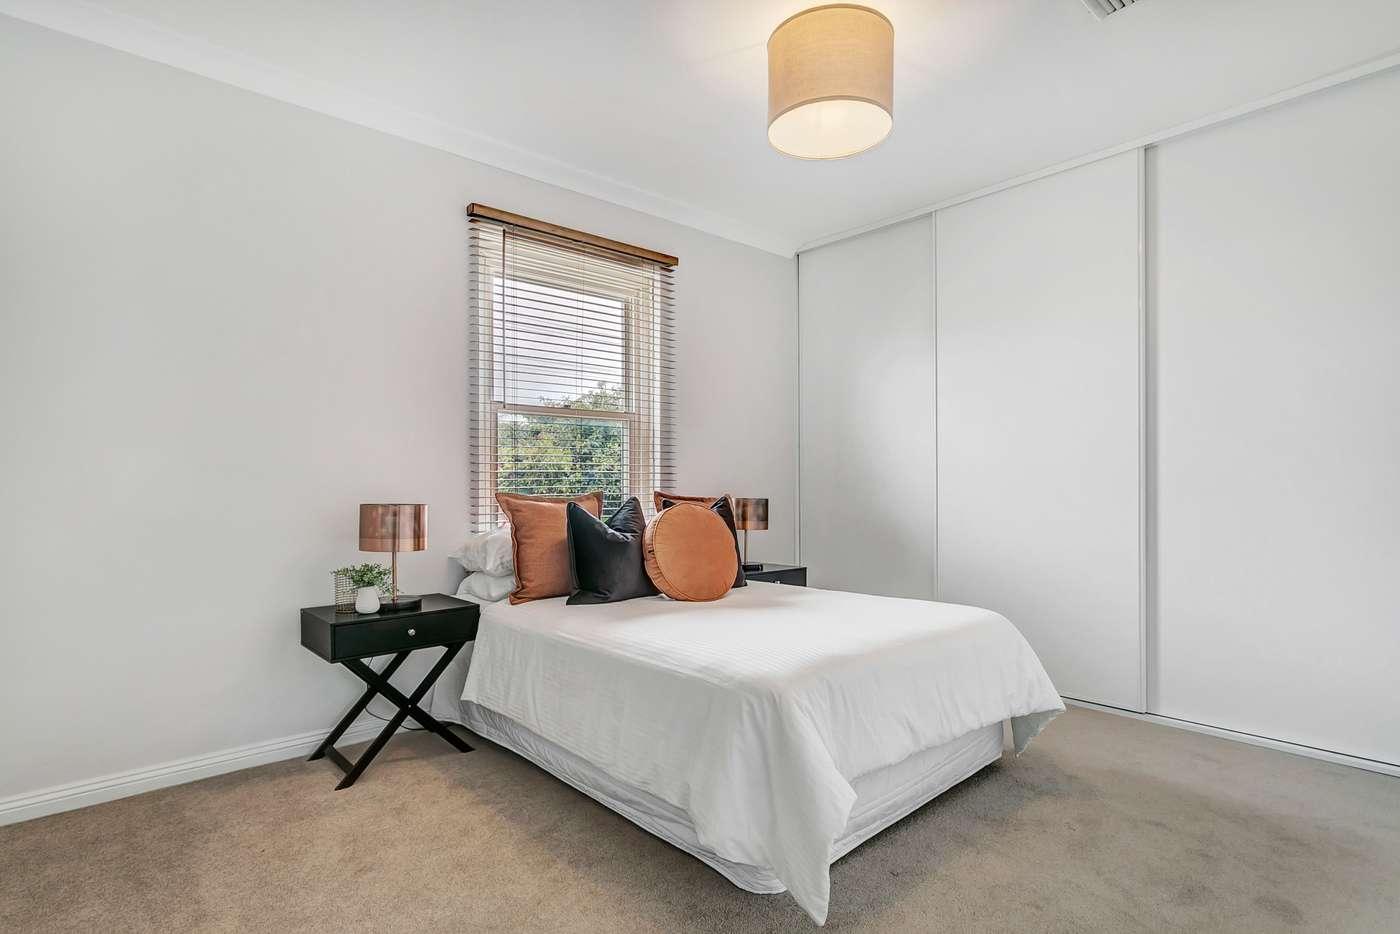 Sixth view of Homely house listing, 176 Raglan Avenue, South Plympton SA 5038